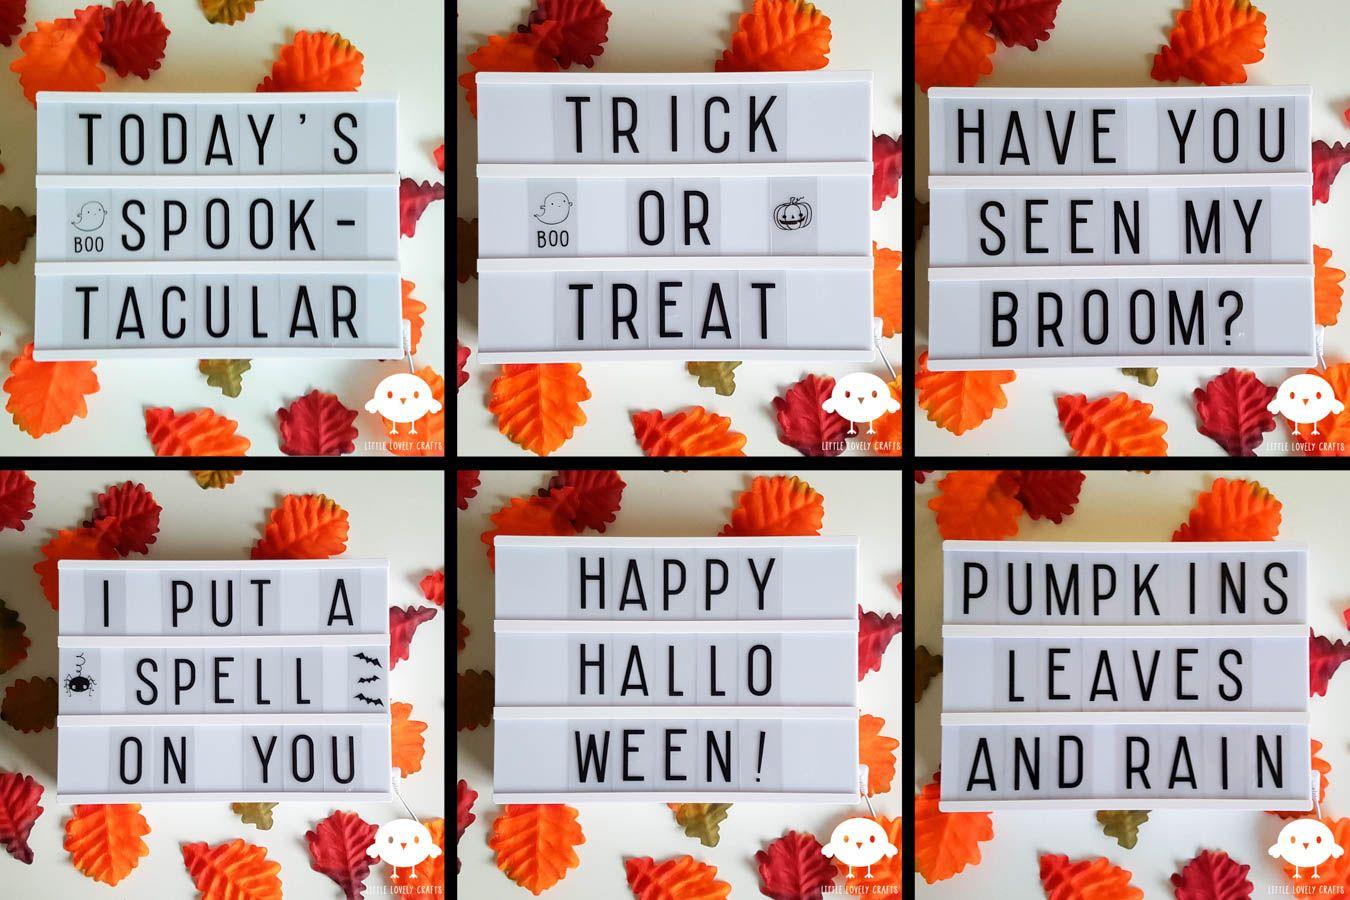 Hallo Halloween Decoraties : Lightbox ideas for halloween halloween cinema